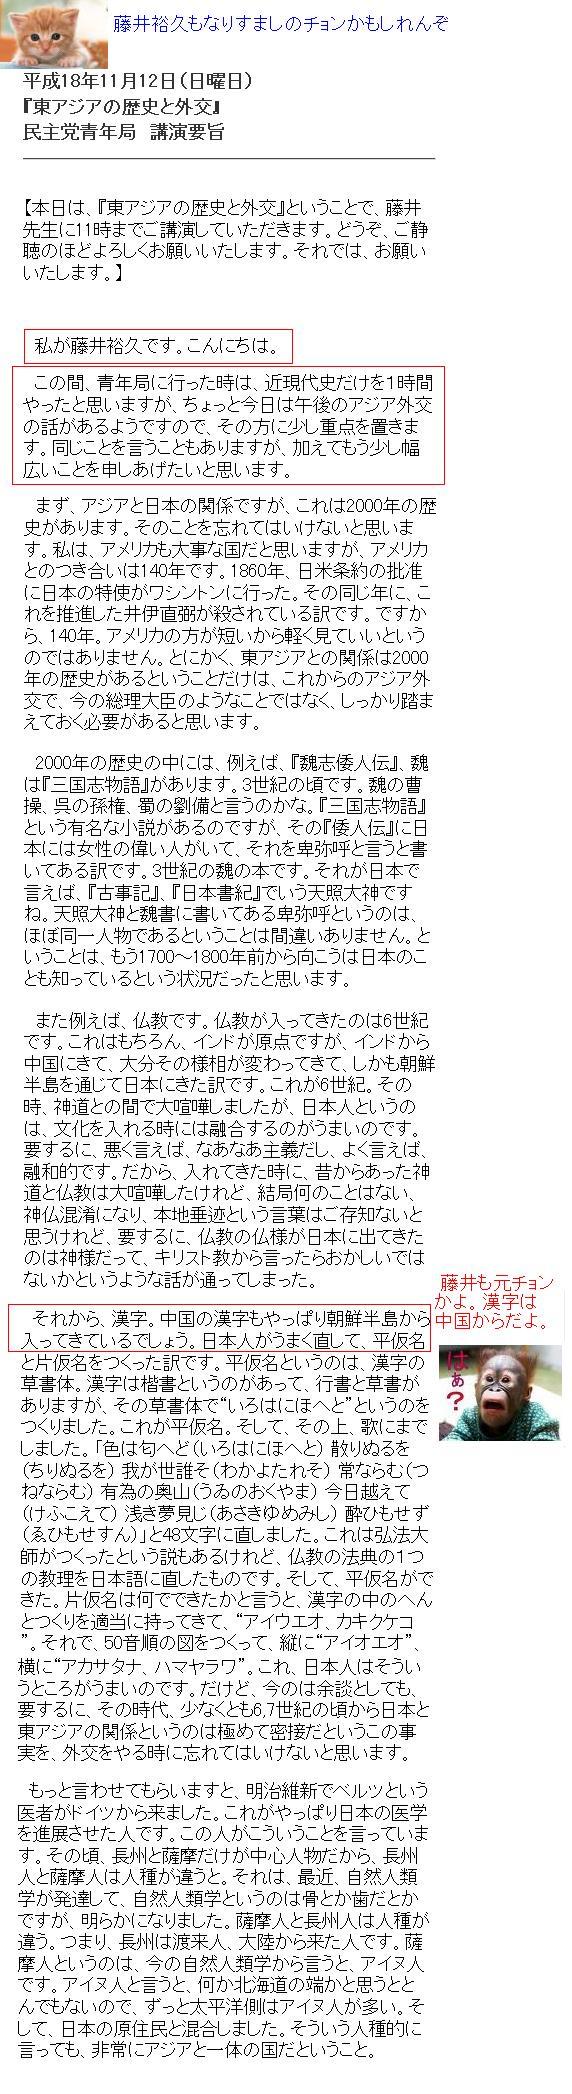 fujiichonggiwaku1.jpg